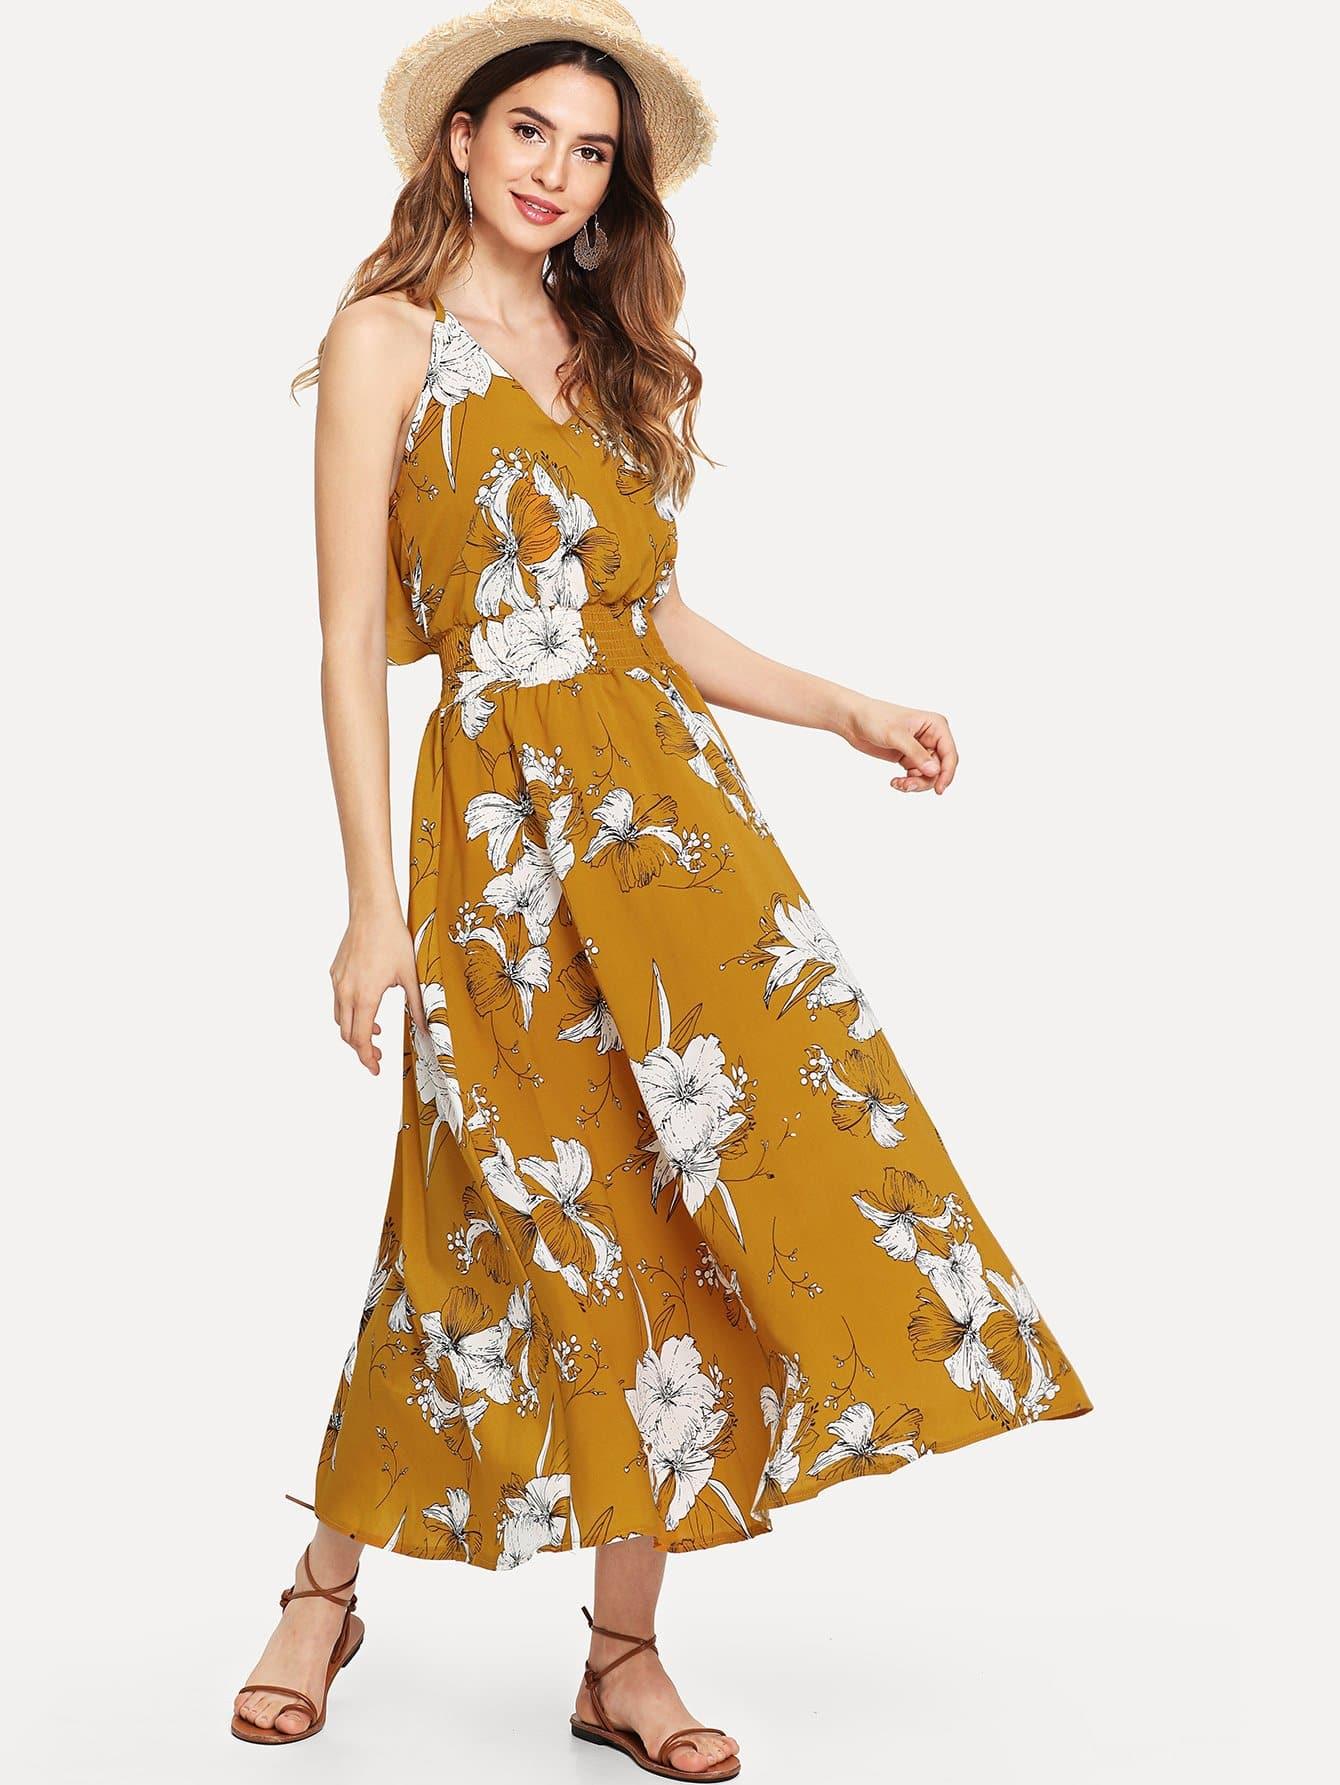 Ruffle Trim Cut Out Back Floral Dress ruffle trim cut out back halter top